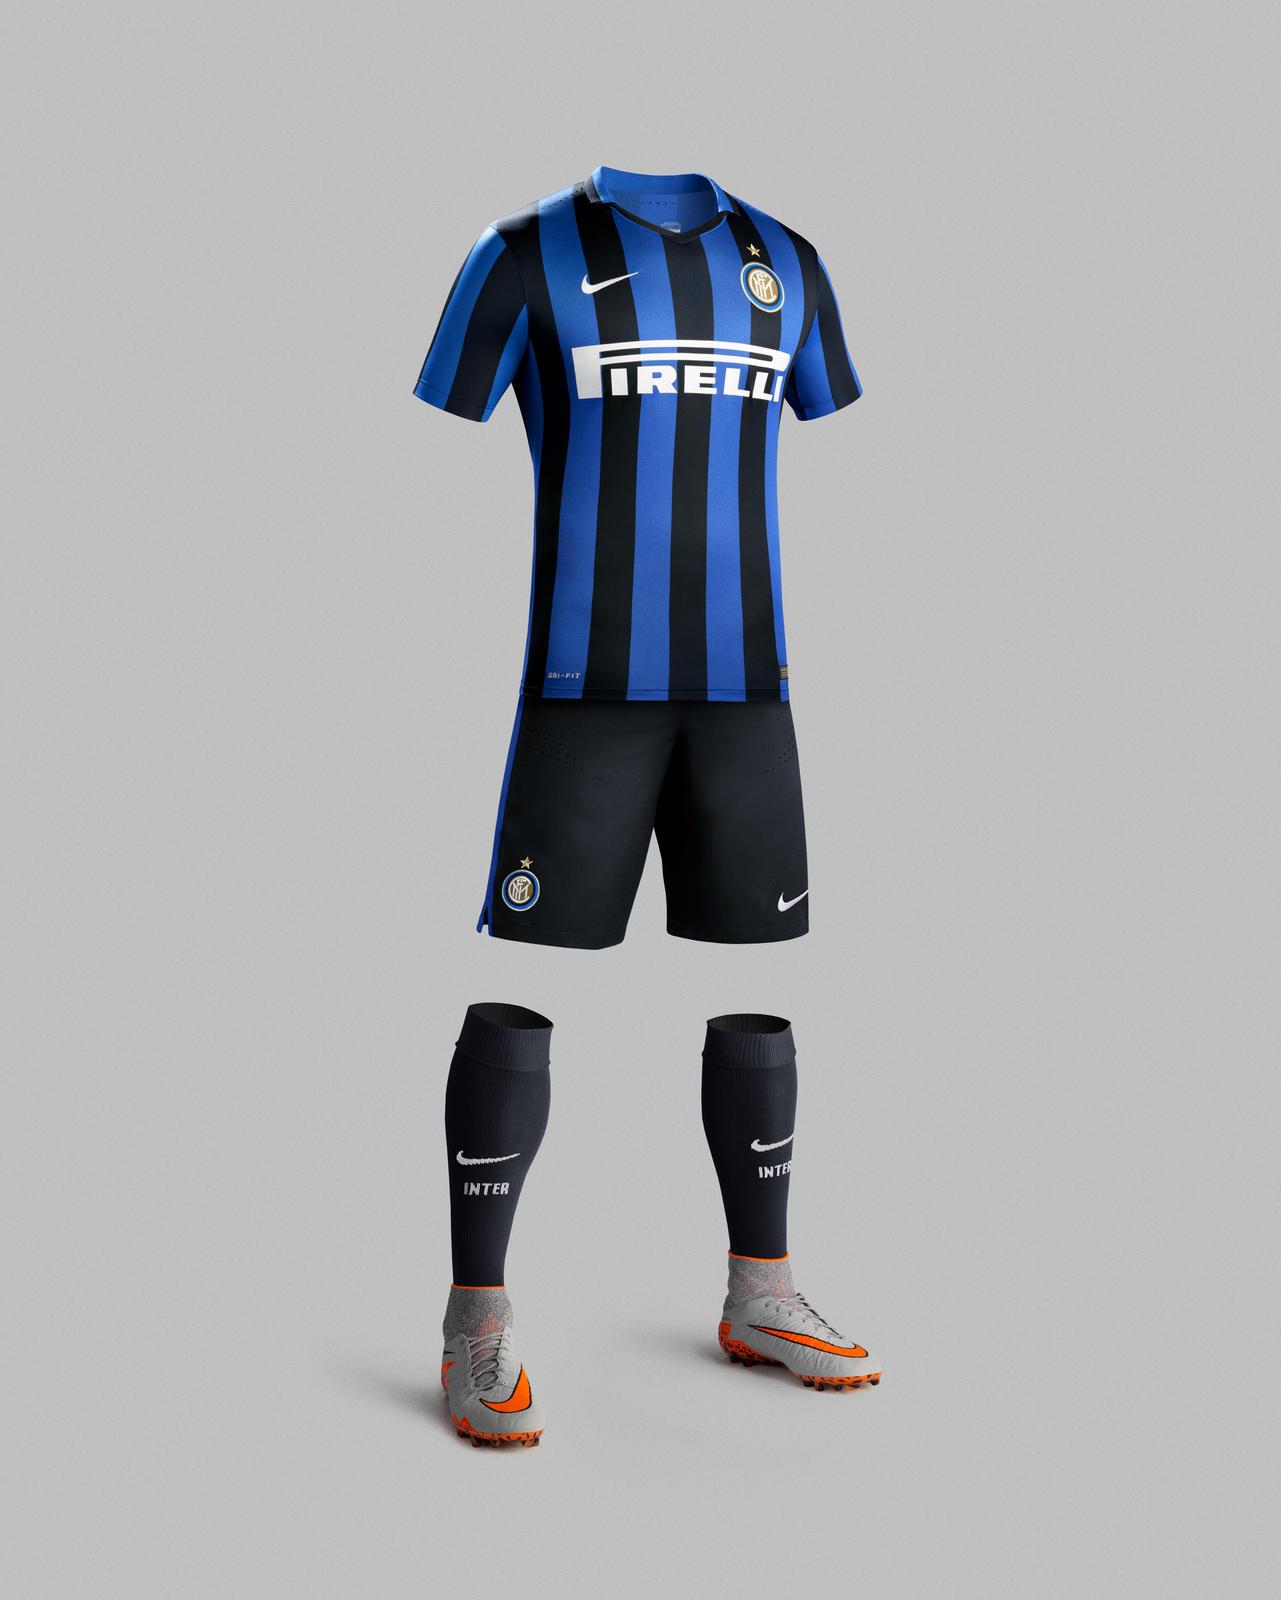 Fa15_Club_Kits_PR_Match_Full_Body_H_Inter_Milan_R_native_1600.jpg